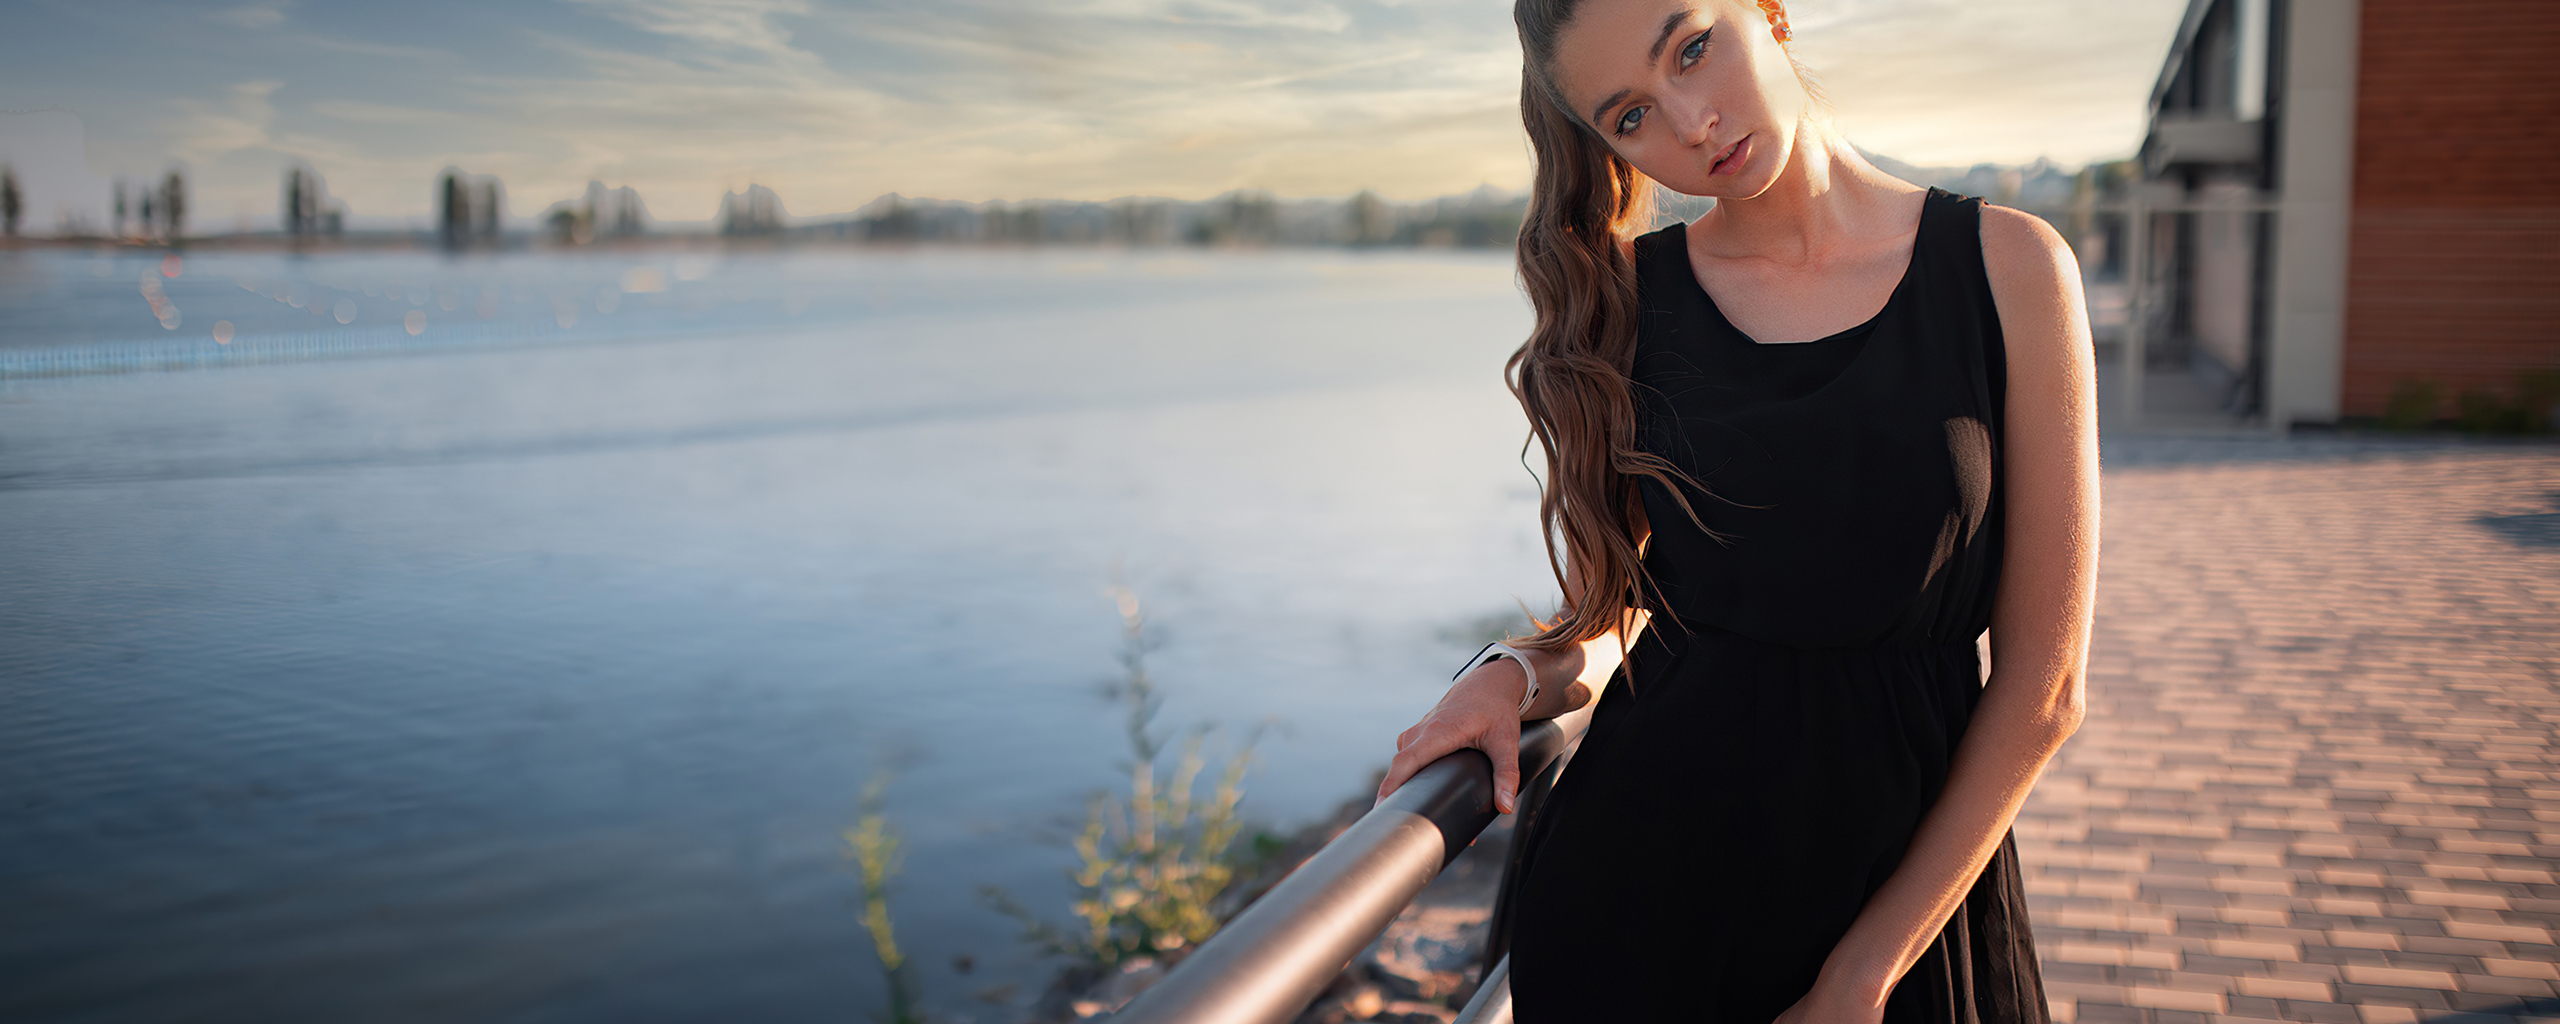 girl-black-dress-beautiful-4k-2c.jpg